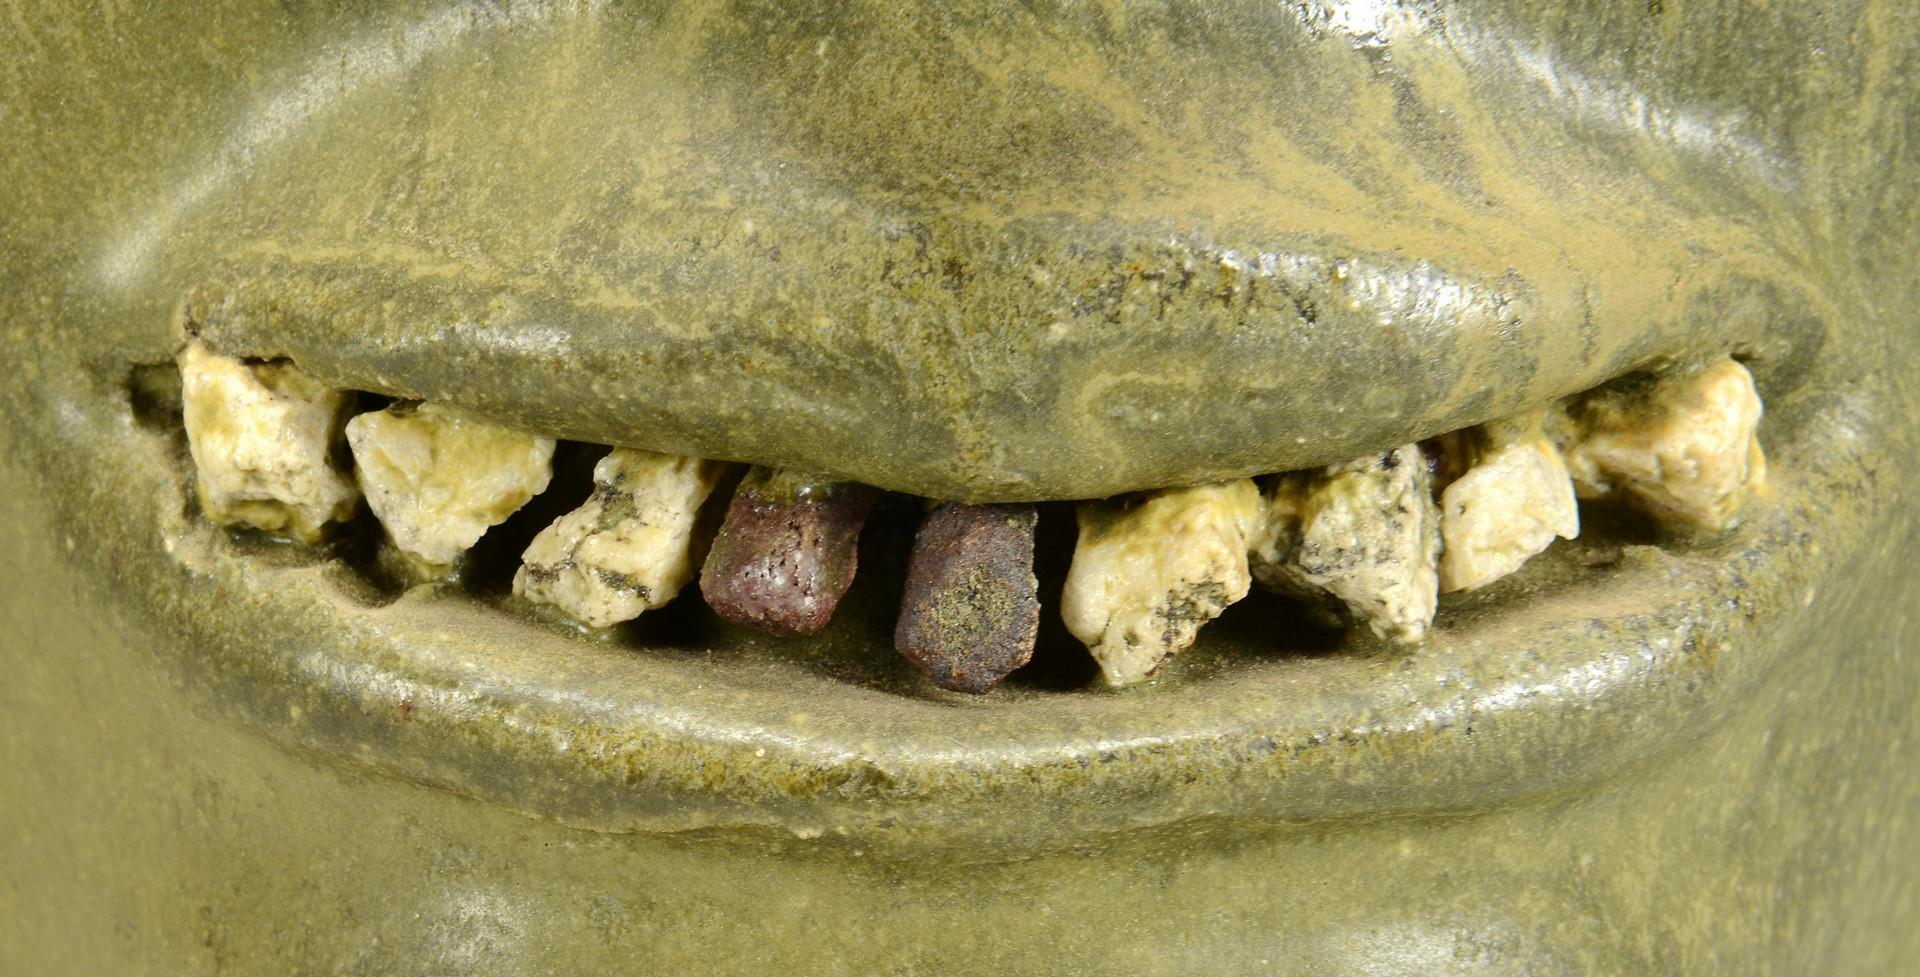 Lot 393: Lanier Meaders Face Jug, rock teeth